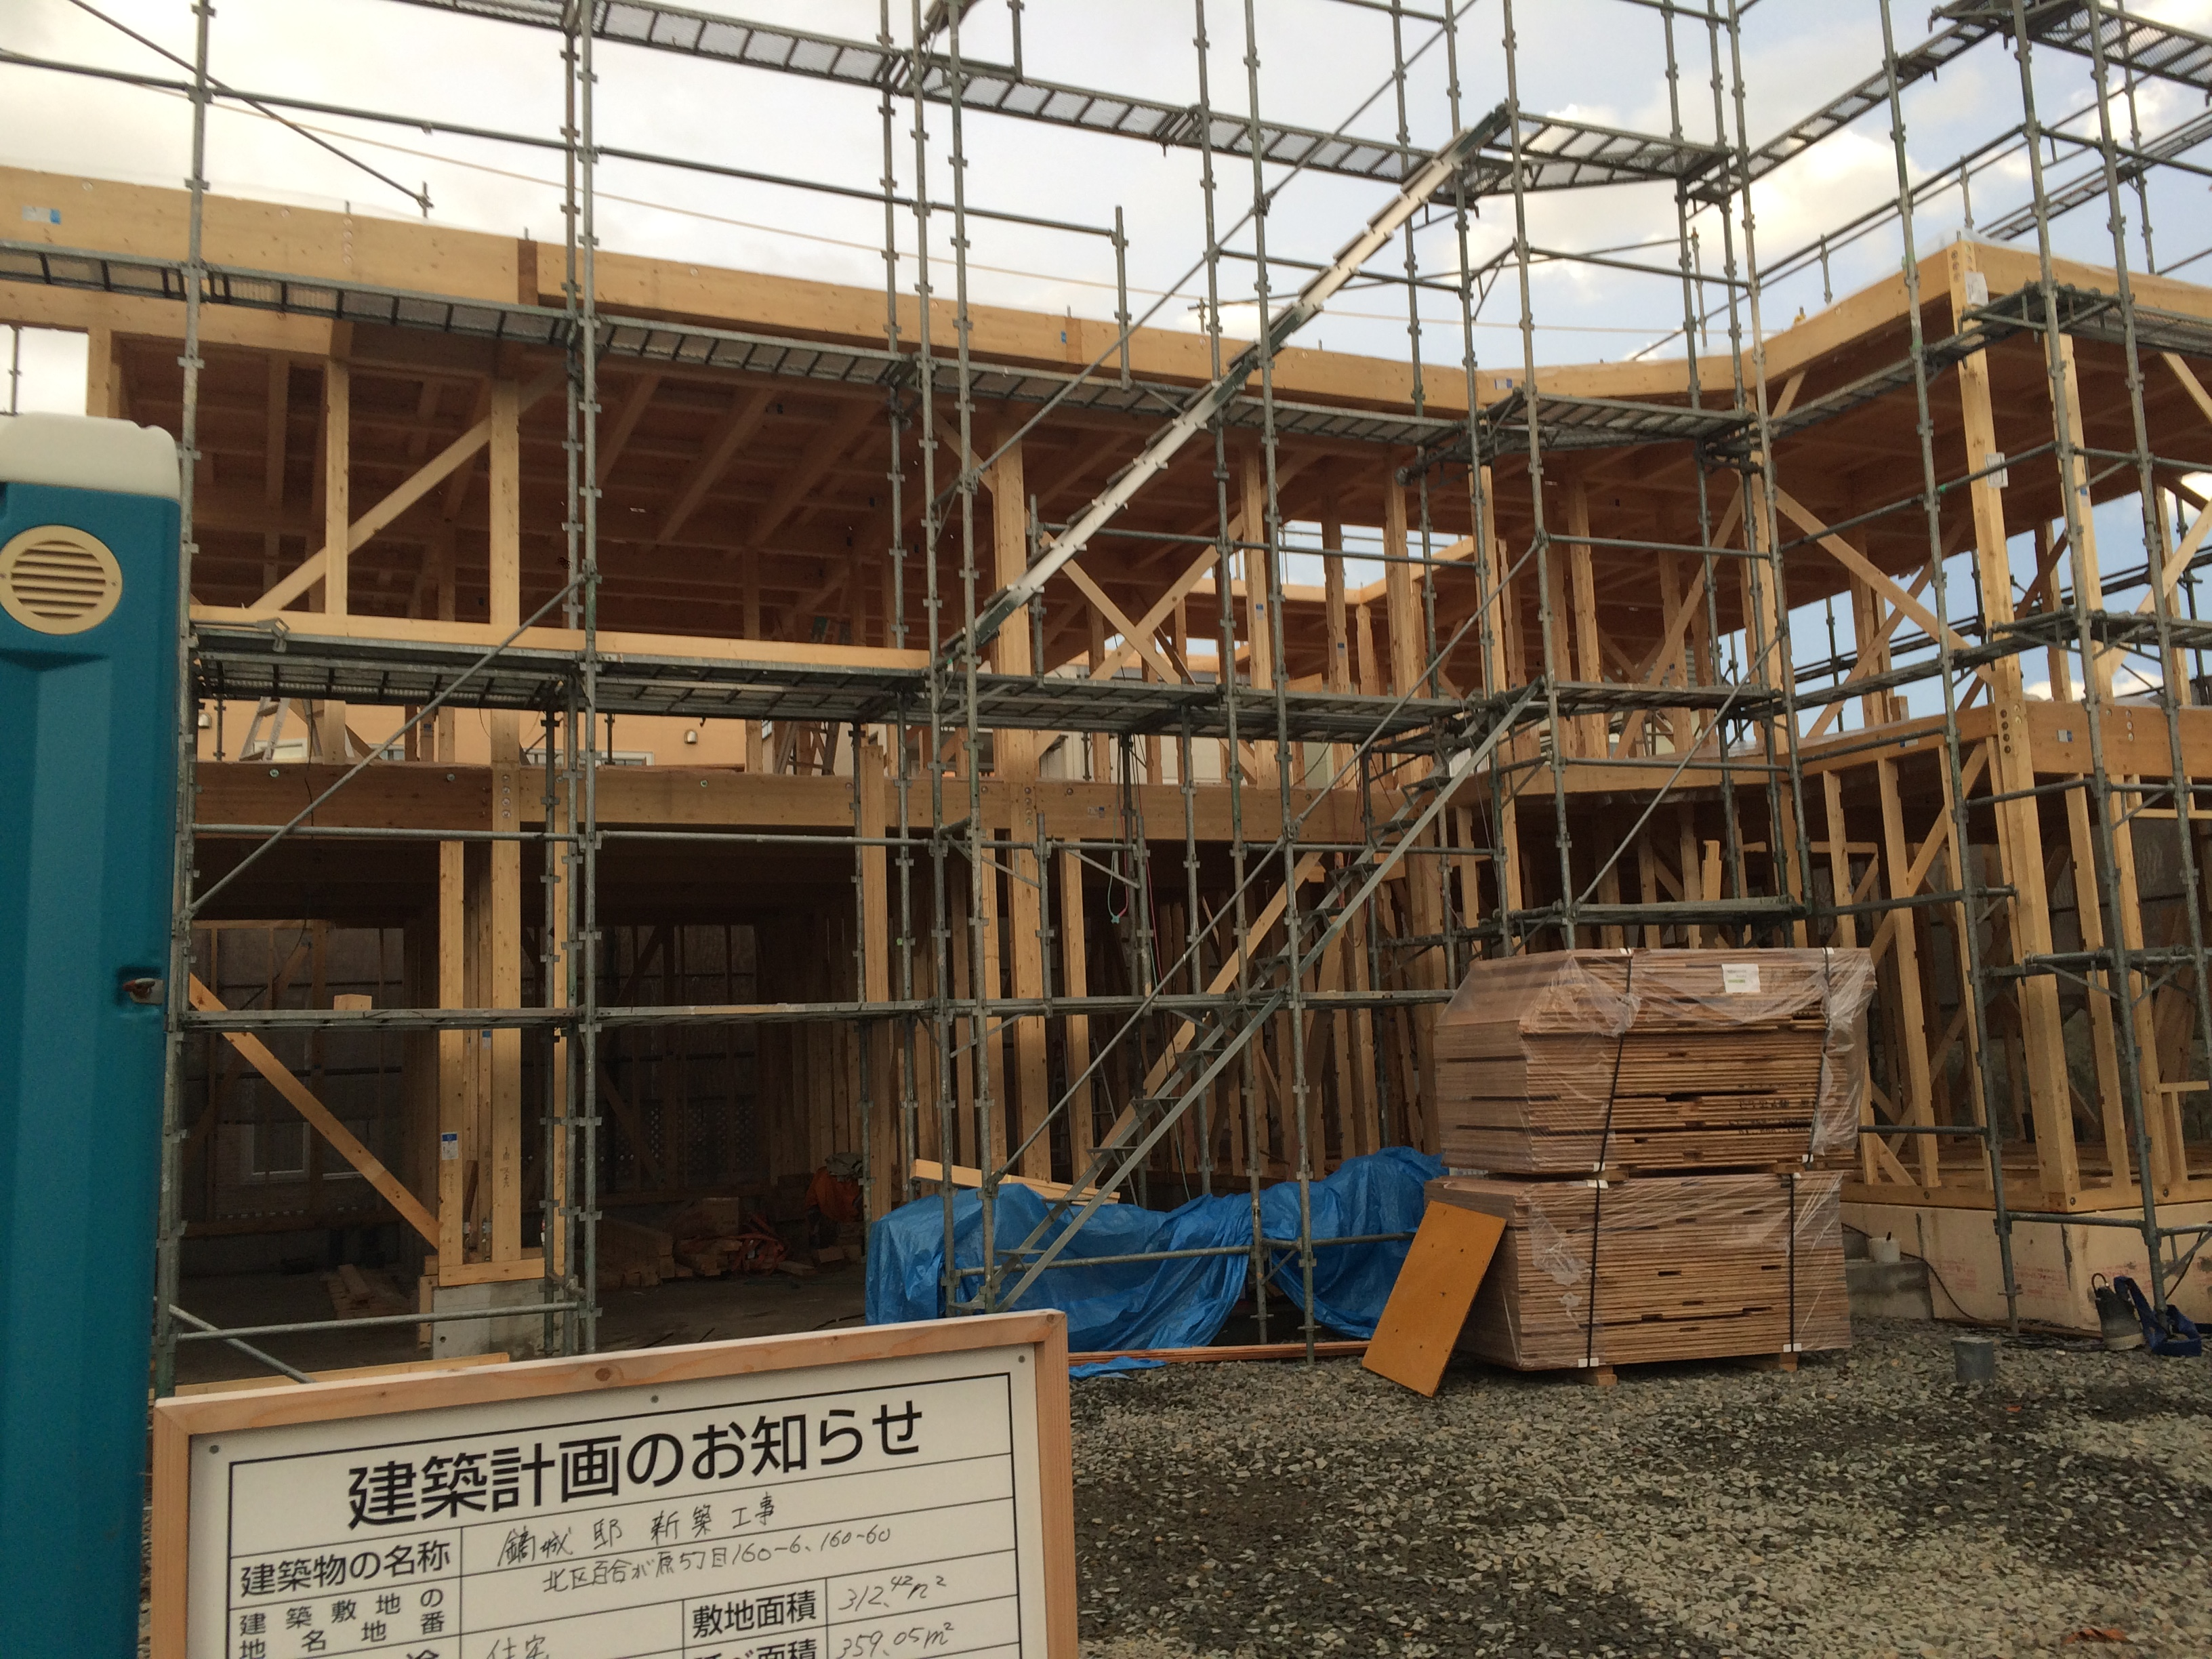 百合が原新築工事 ②